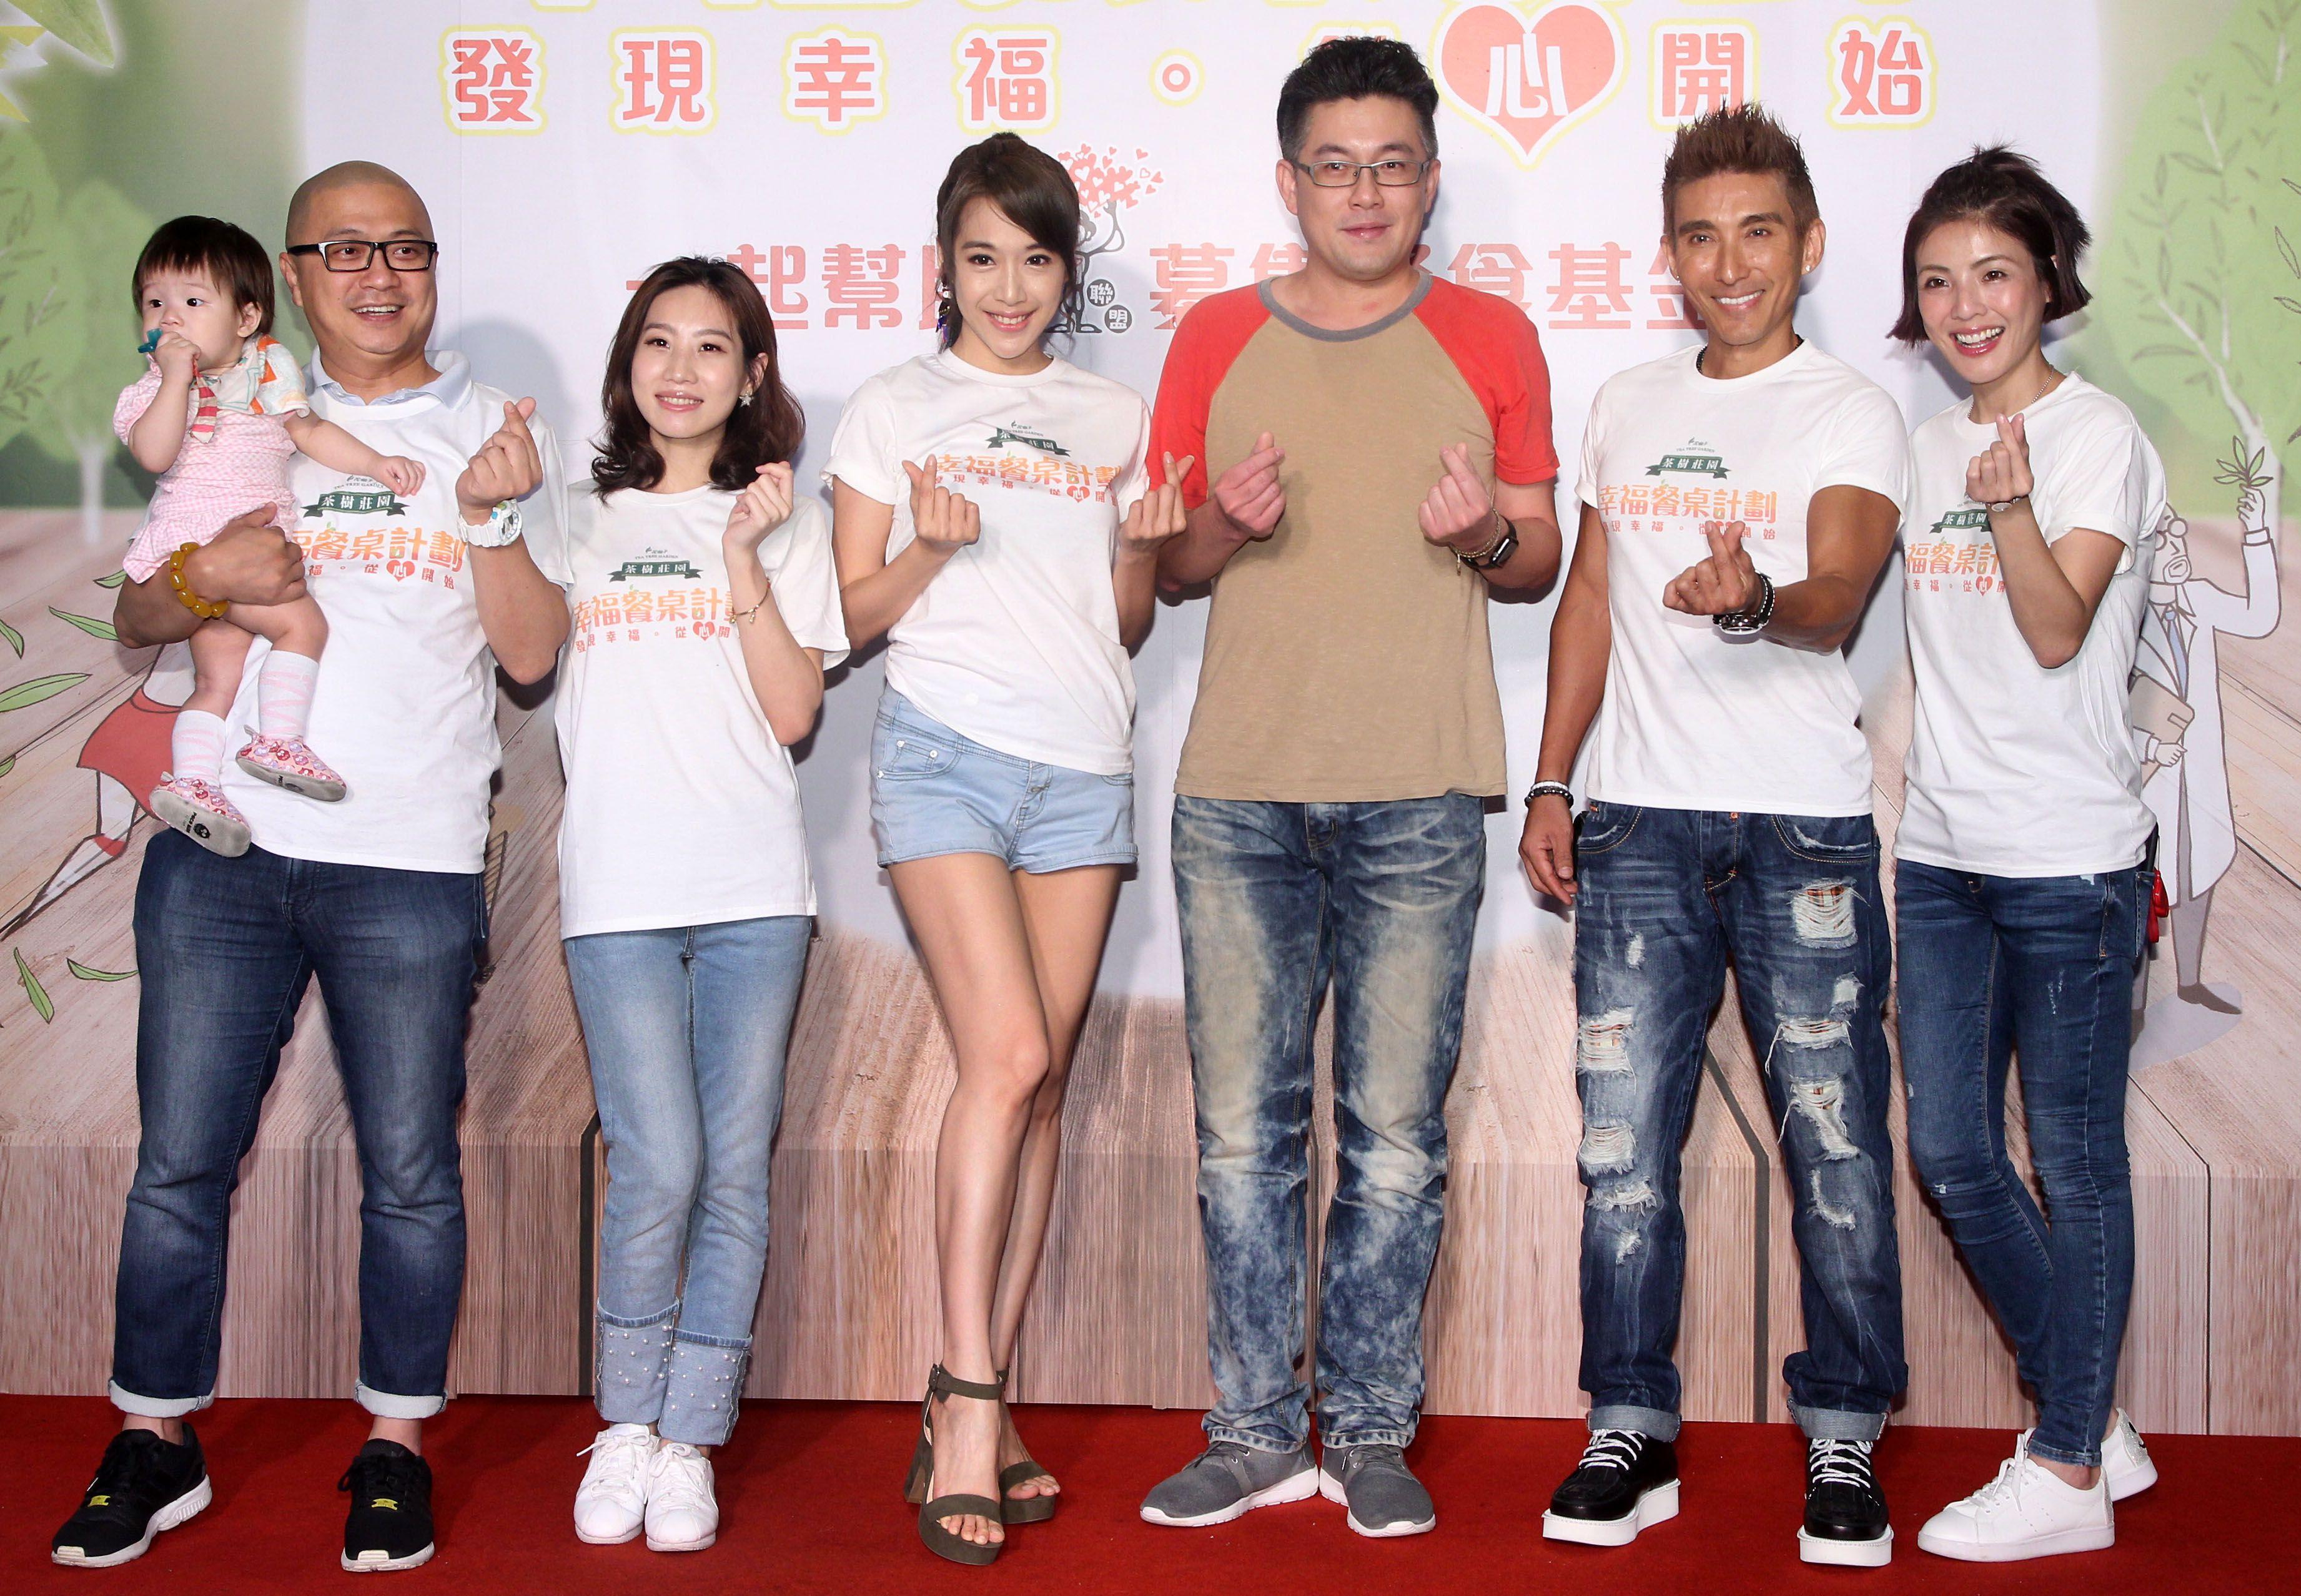 PAUL、咪咪 、依依 、潘若迪 、徐小可參加茶樹莊園幸福餐桌計畫公益活動。(記者邱榮吉/攝影)